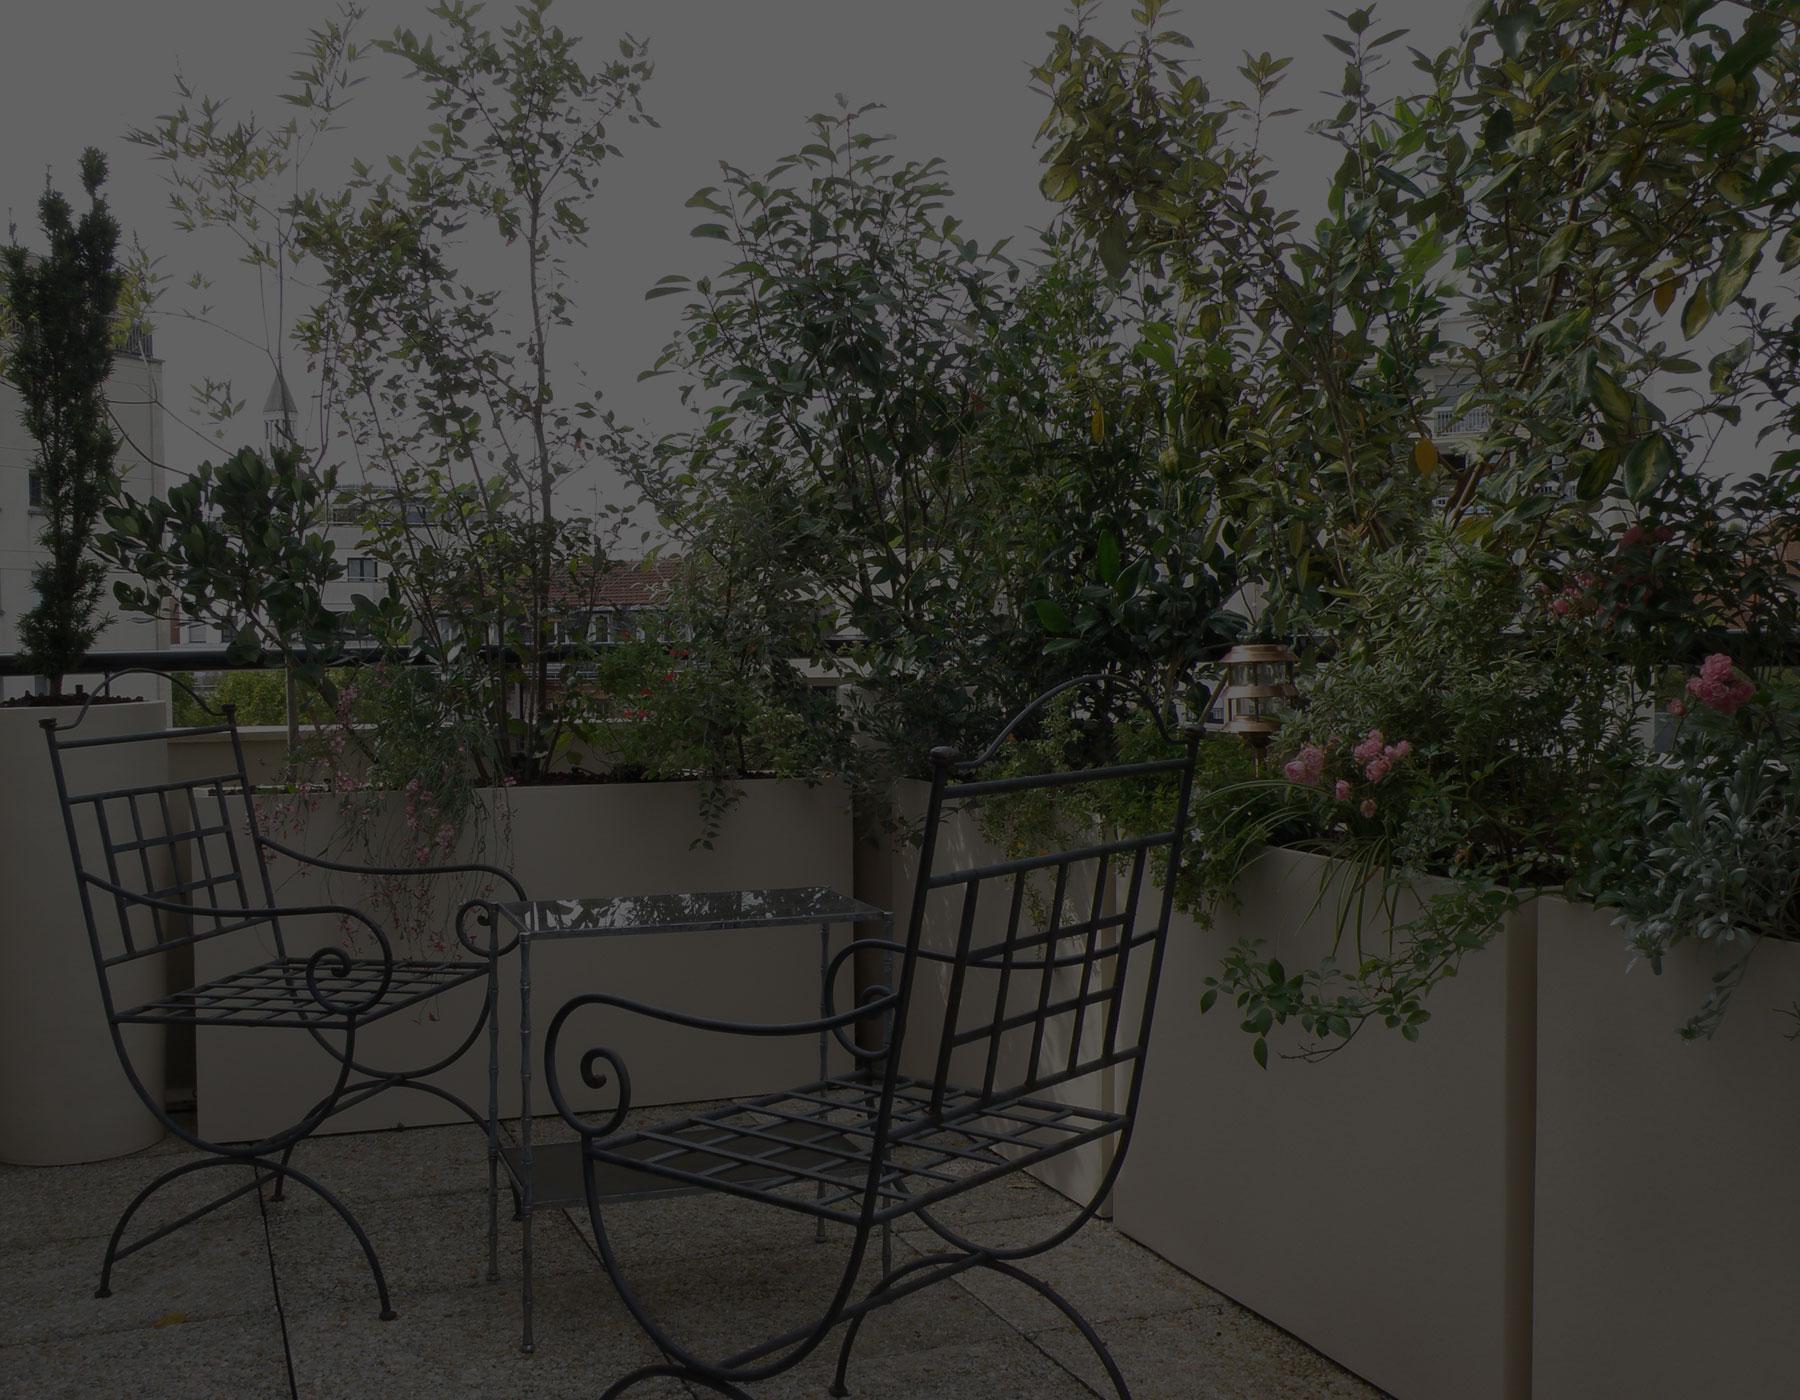 Paysagiste paris 10 cr ation am nagement jardin boulogne billancourt - Stephane sauvage jardin boulogne billancourt ...